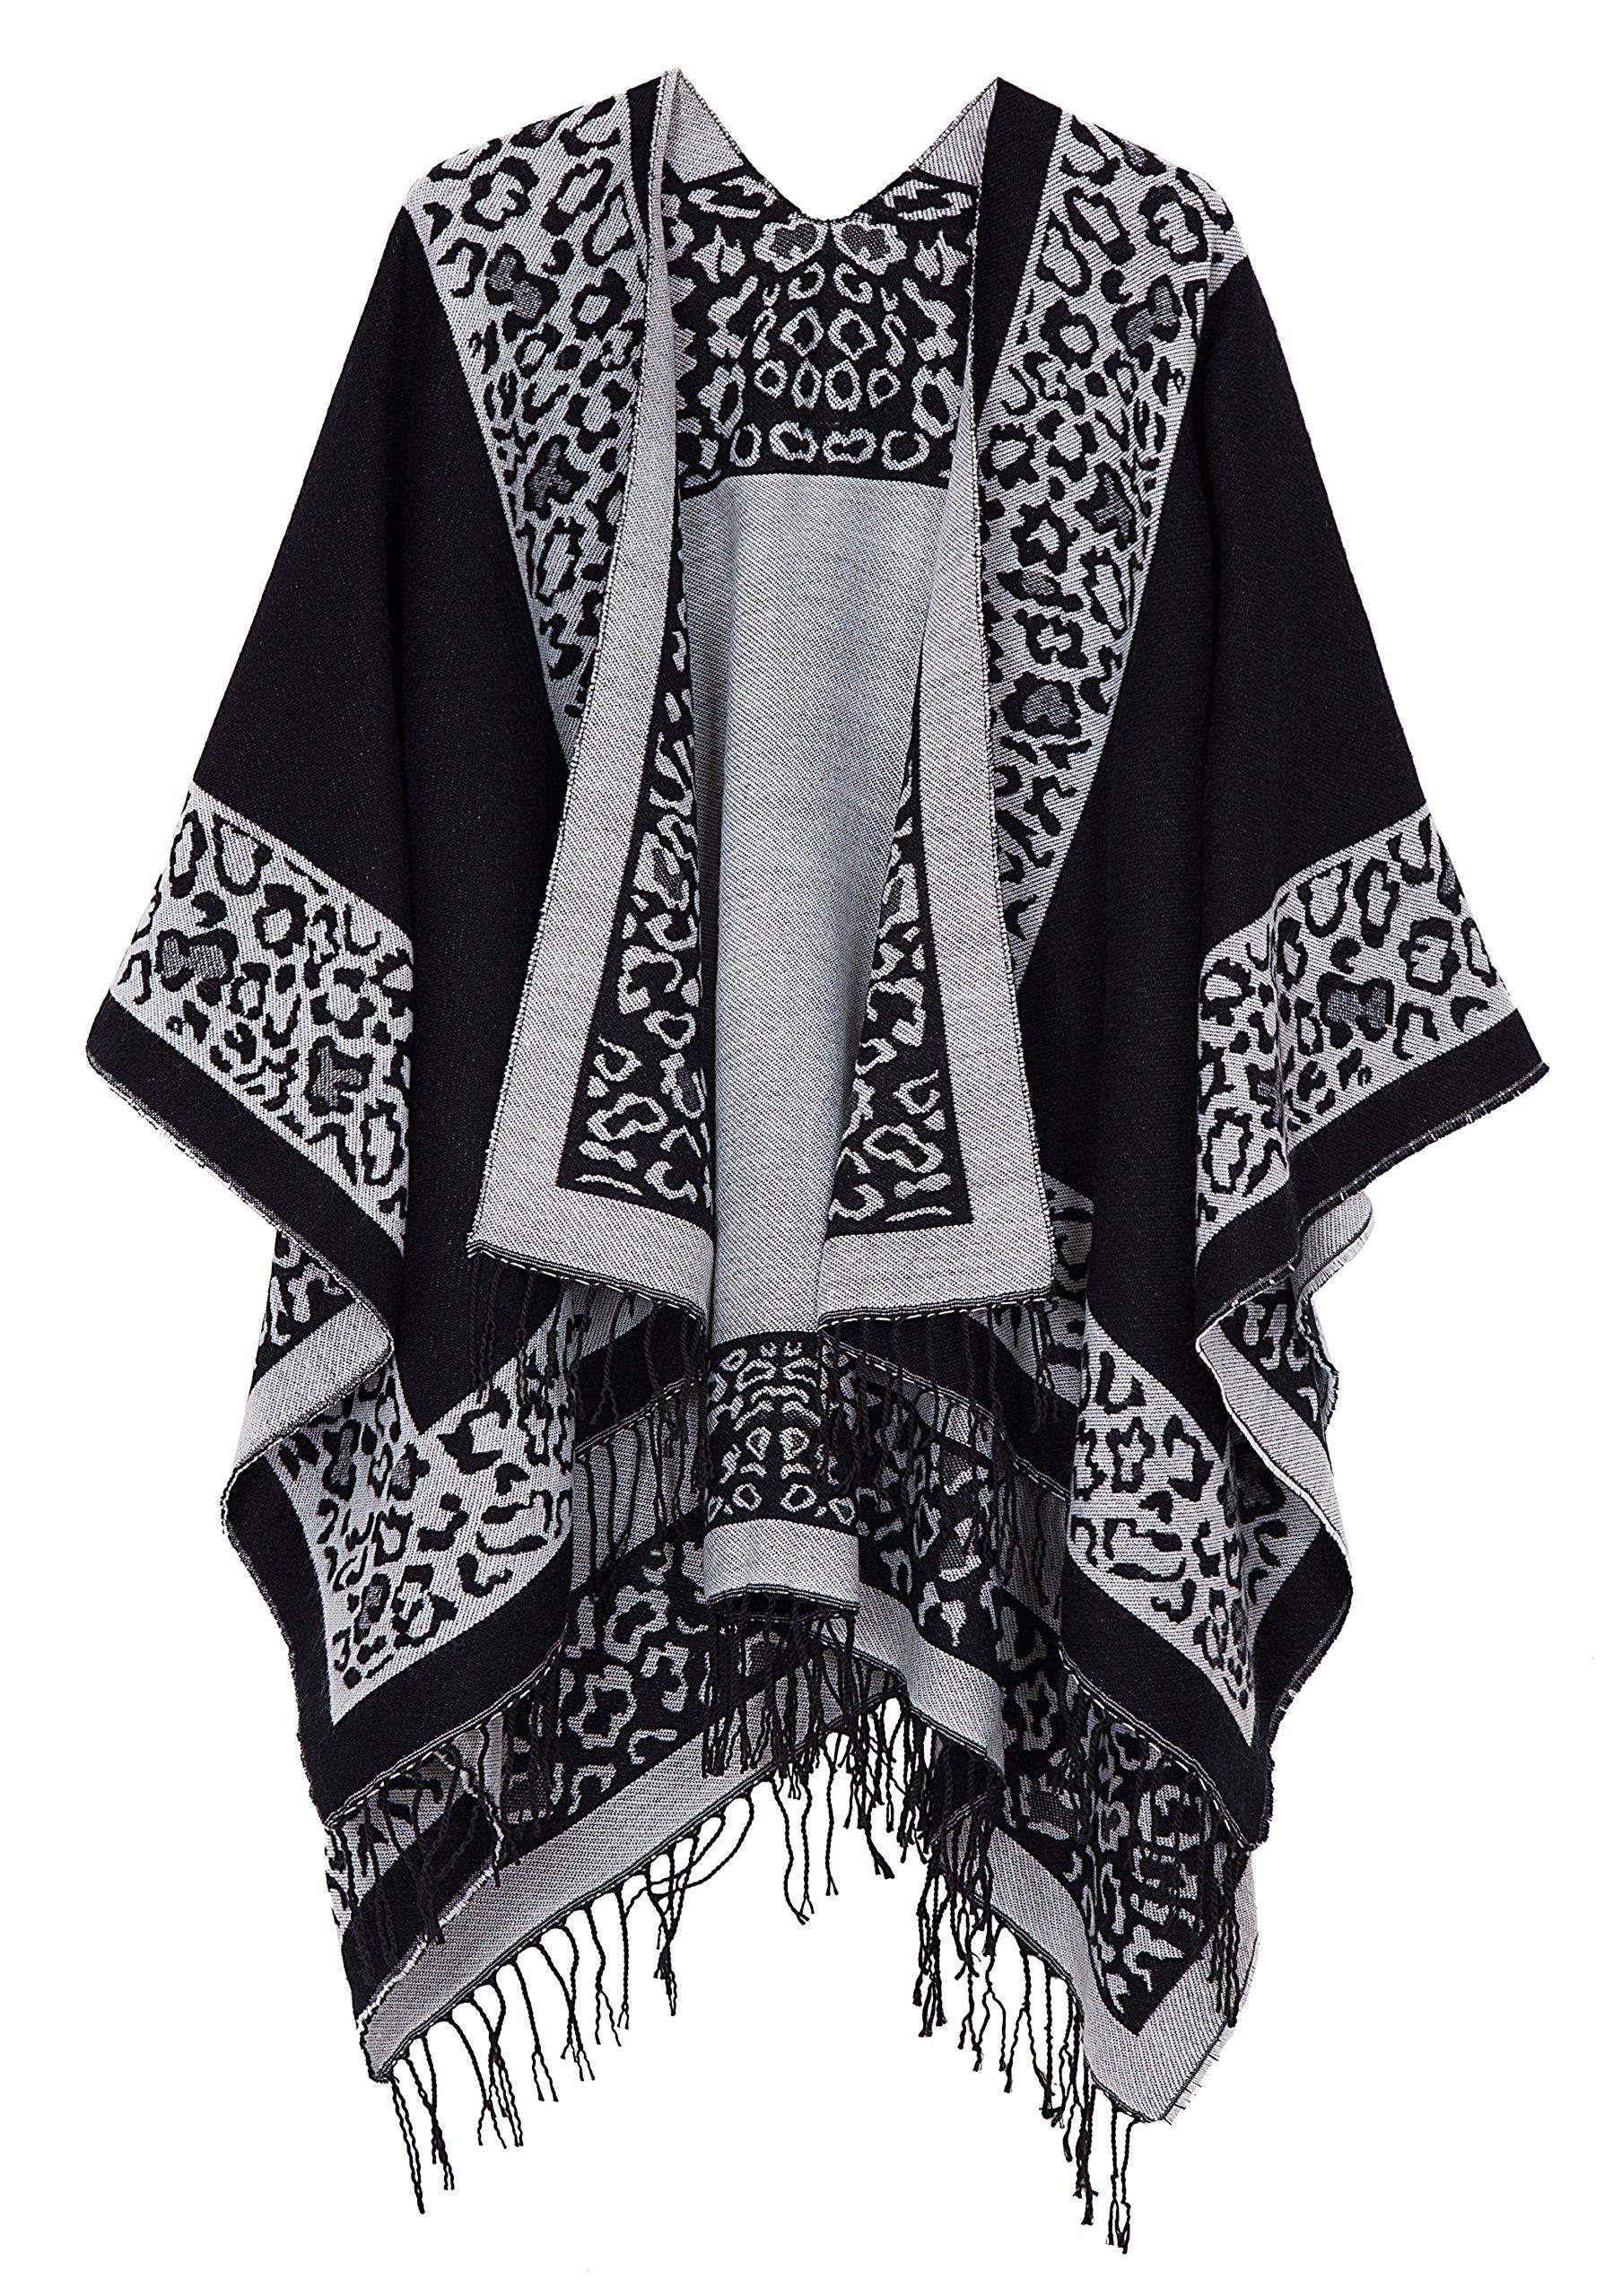 Urban CoCo Women's Printed Tassel Open front Poncho Cape Cardigan Wrap Shawl (Series 11-black)